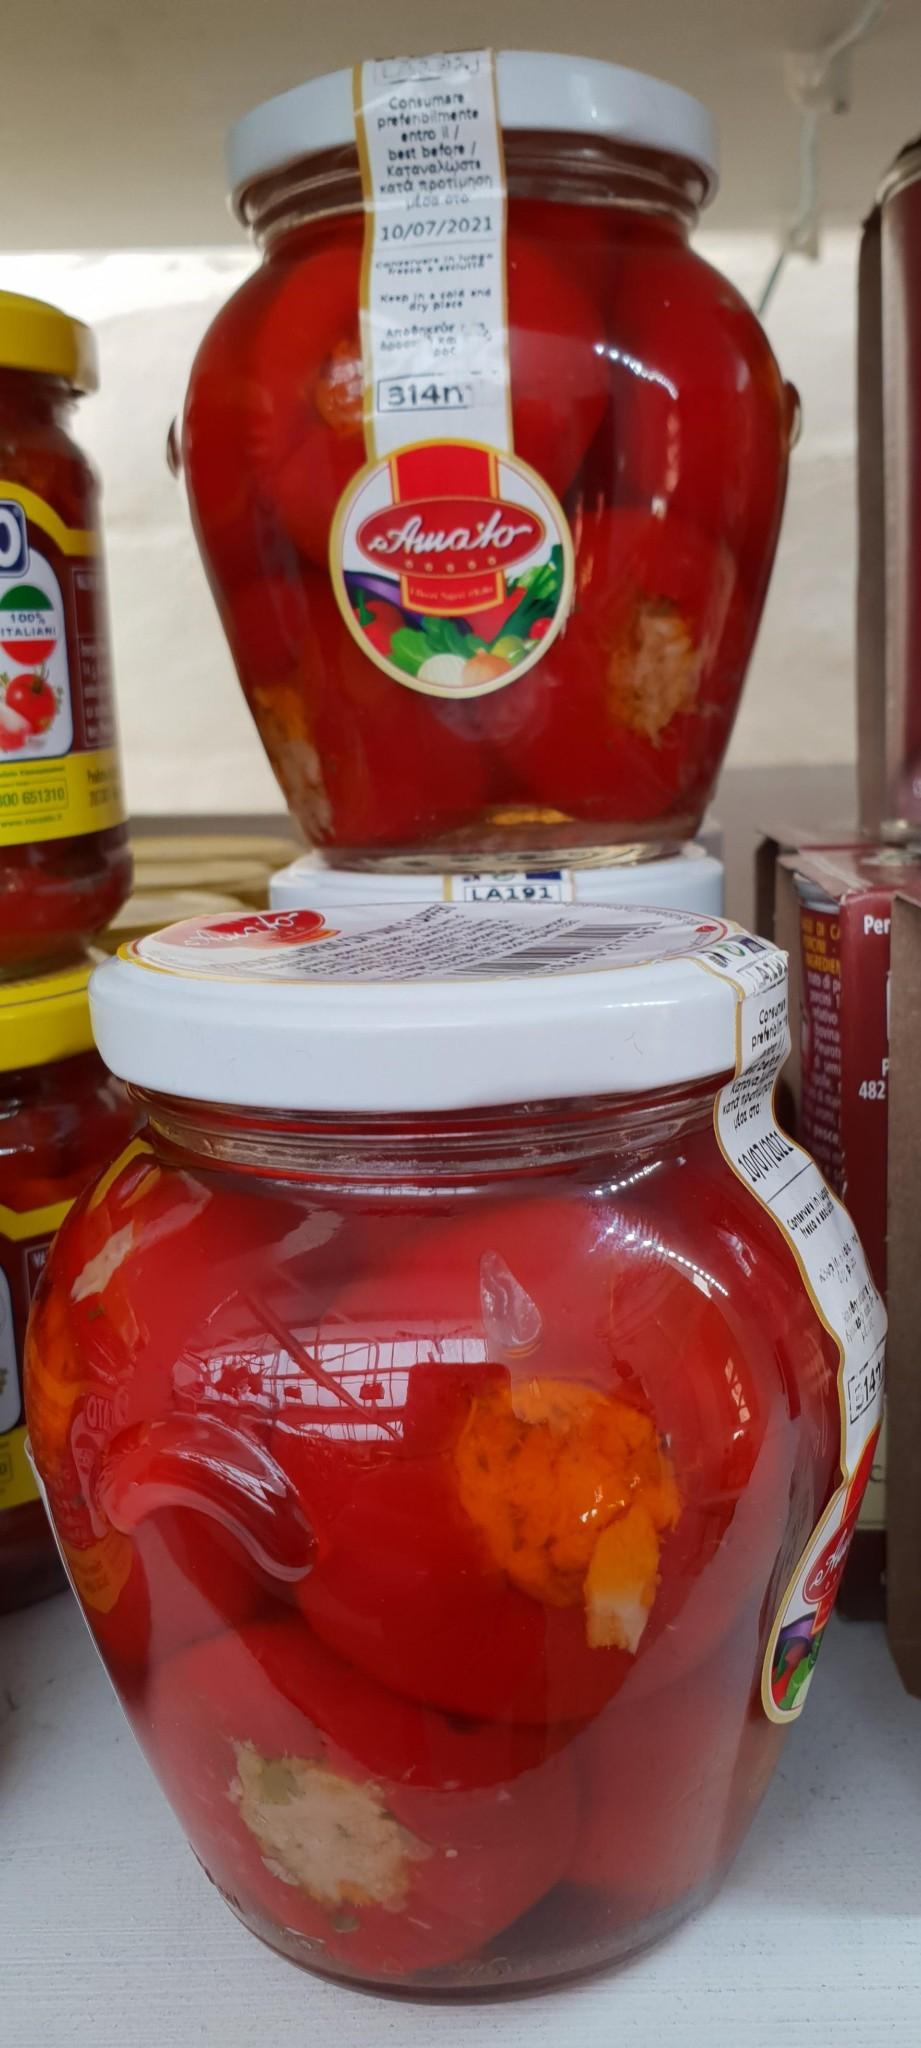 Traditional Tuna stuffed Calabrian Chillies 314g jar